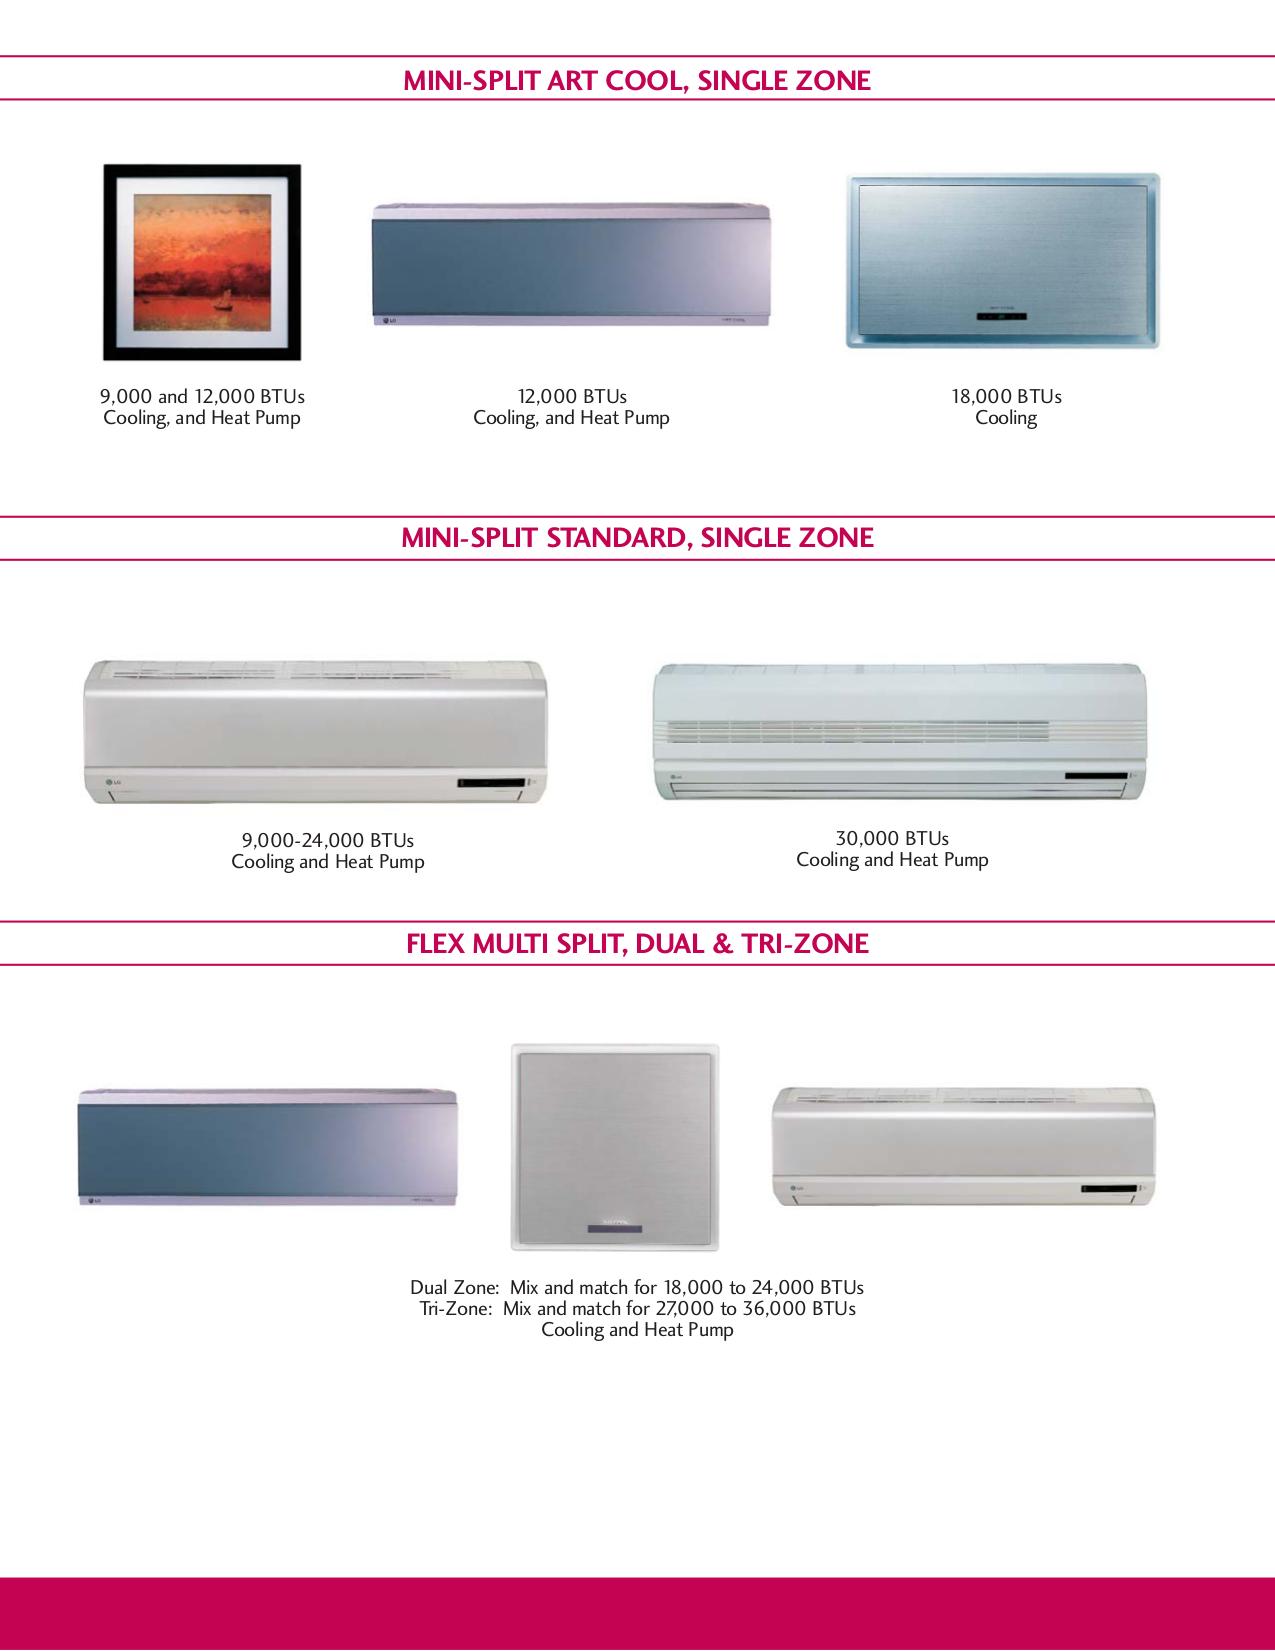 lg split air conditioner service manual pdf